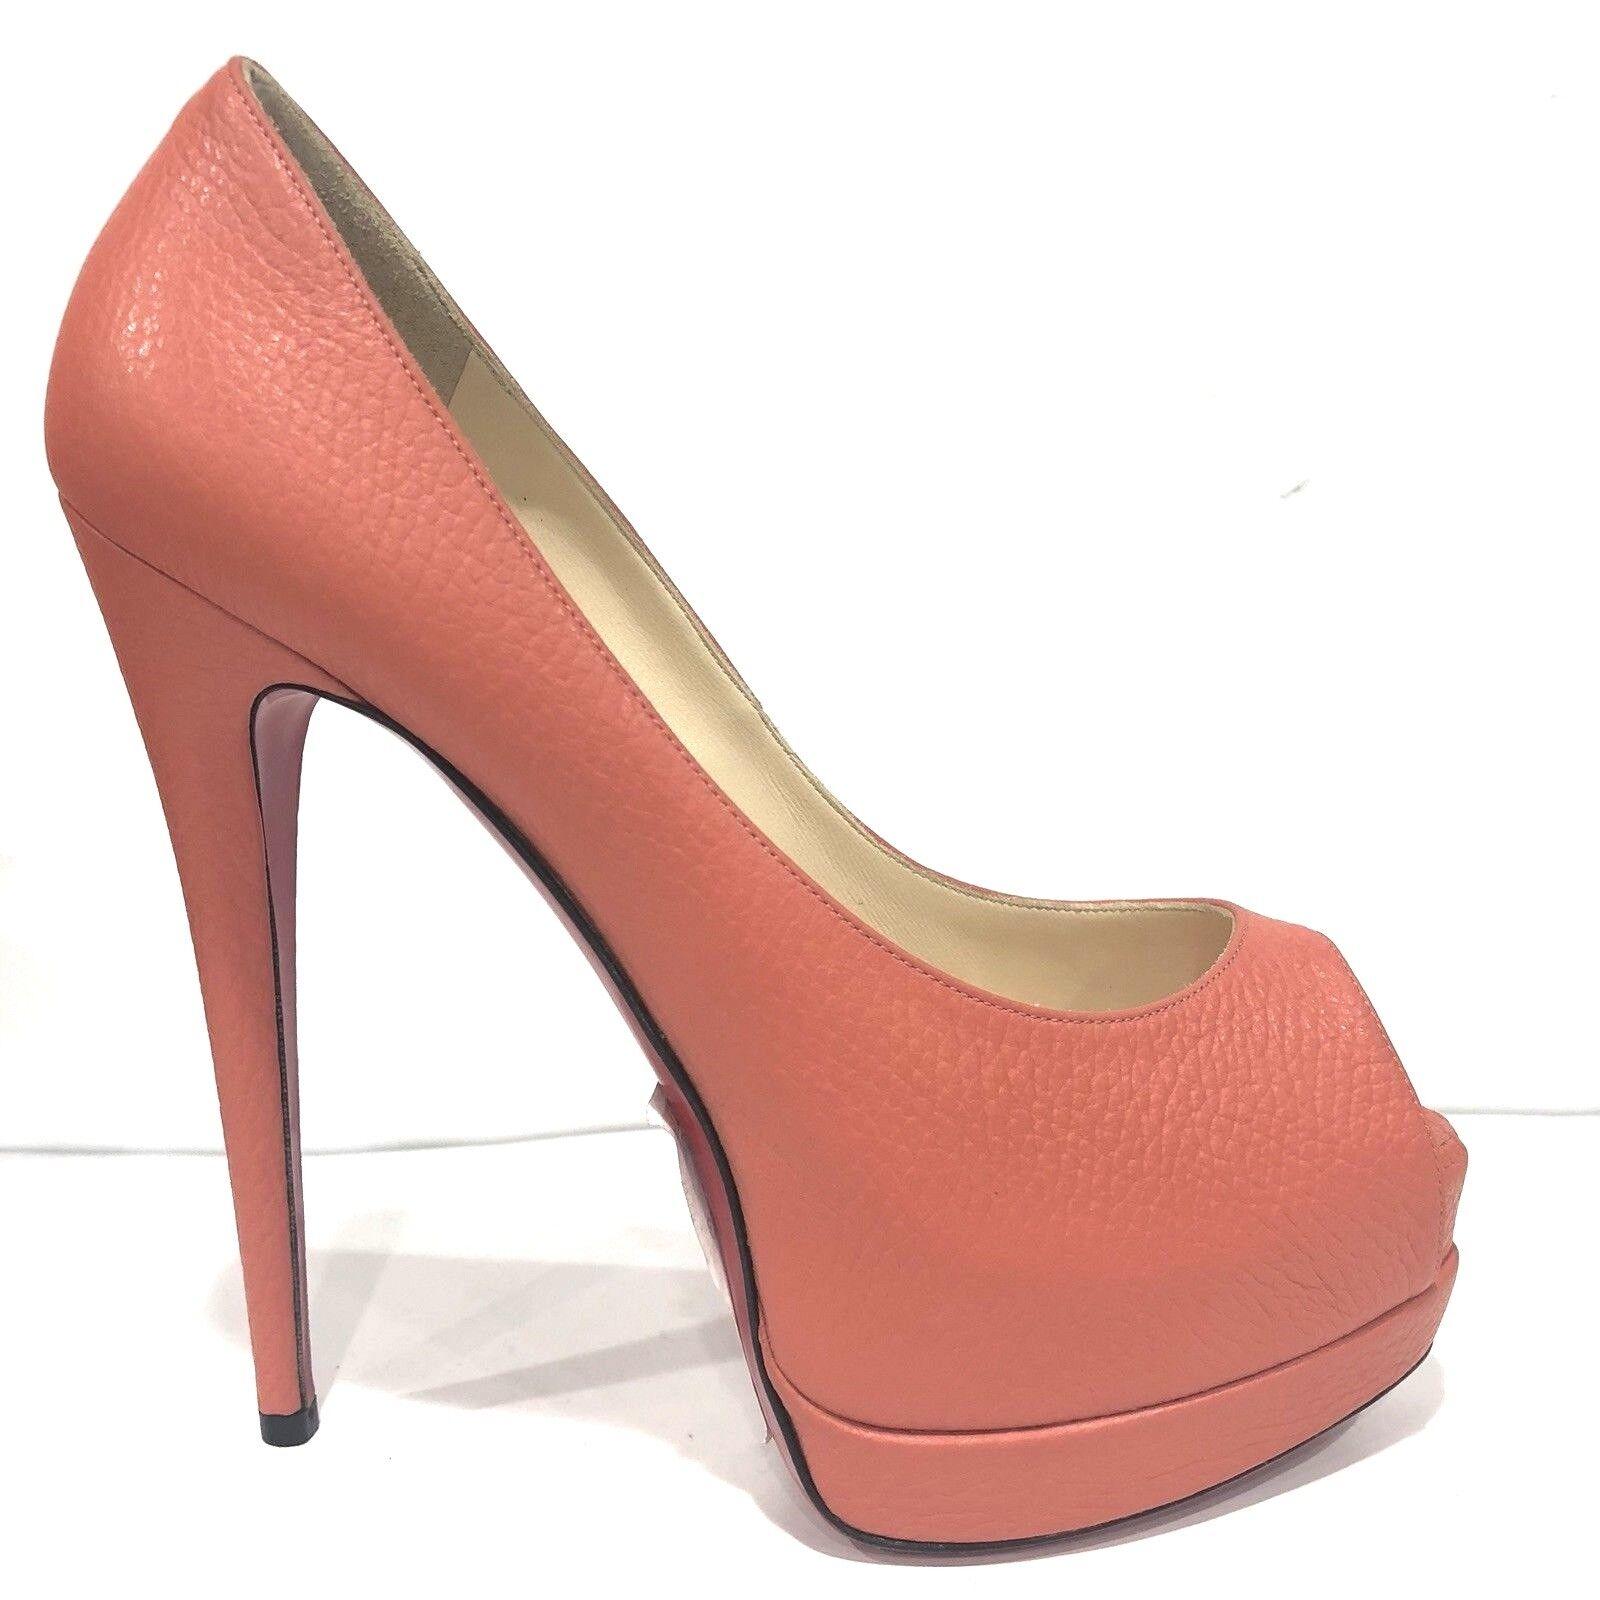 Christian Christian Christian Louboutin Palais Royal Naranja Bomba de Cuero zapatos talla 37.5 US 6.6  mejor vendido